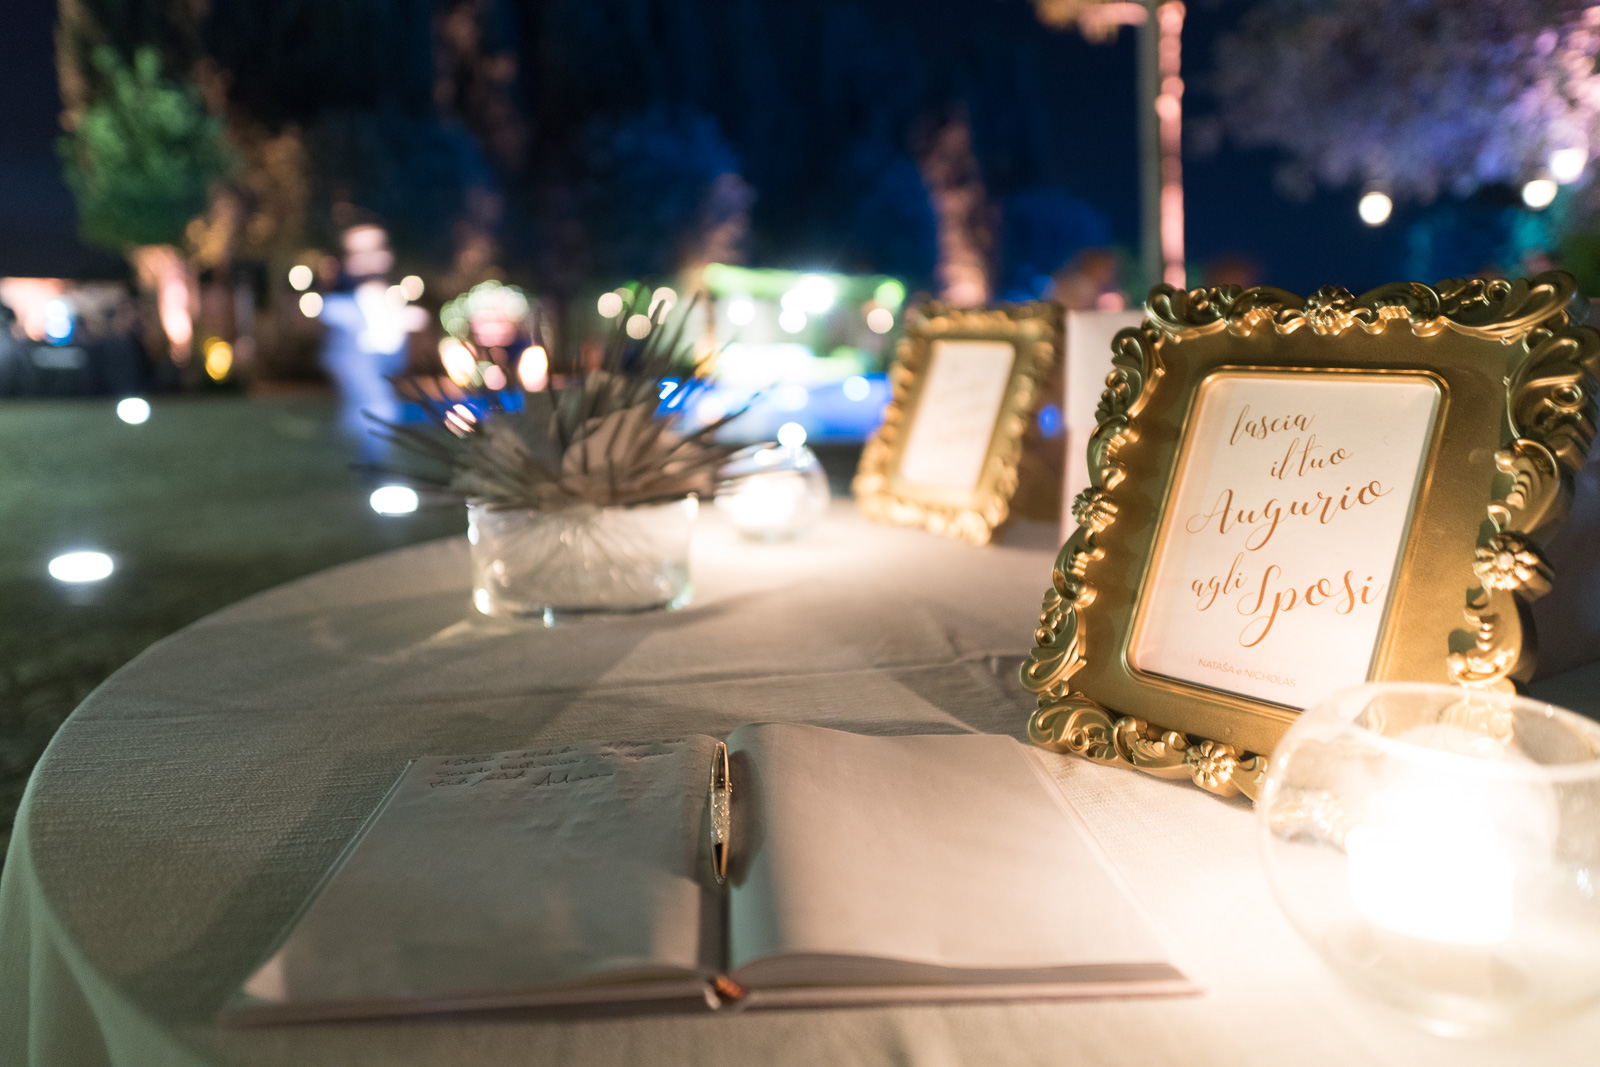 bespoke wedding in apulia (8)